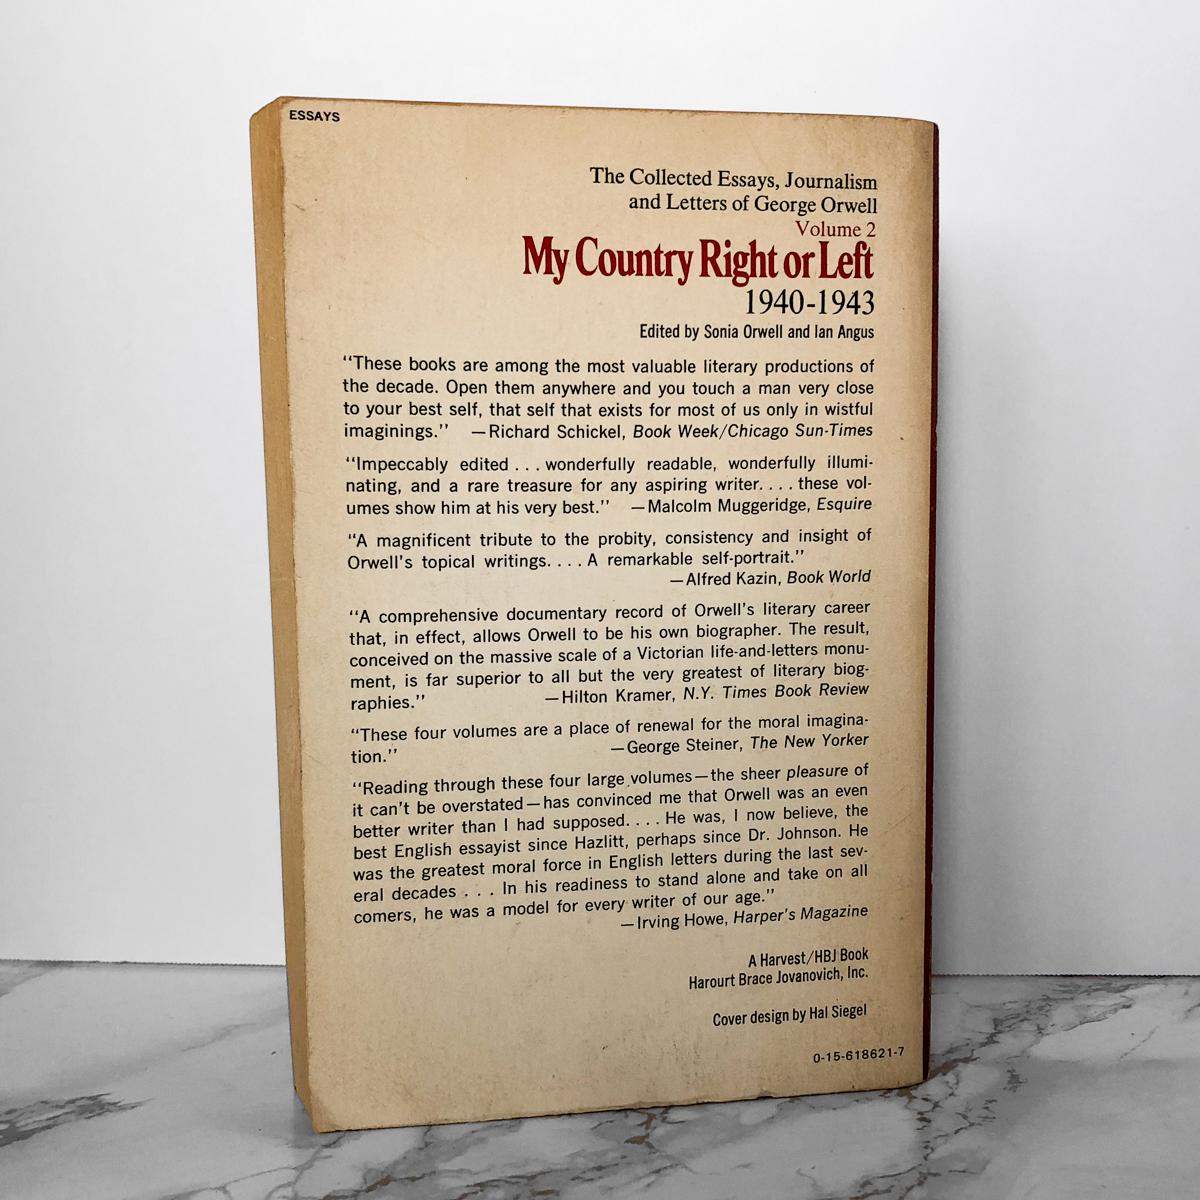 015 George Orwell Essays Mycountryleft 2 1200x1200v1546514406 Essay Frightening 1984 Summary Collected Pdf On Writing Full